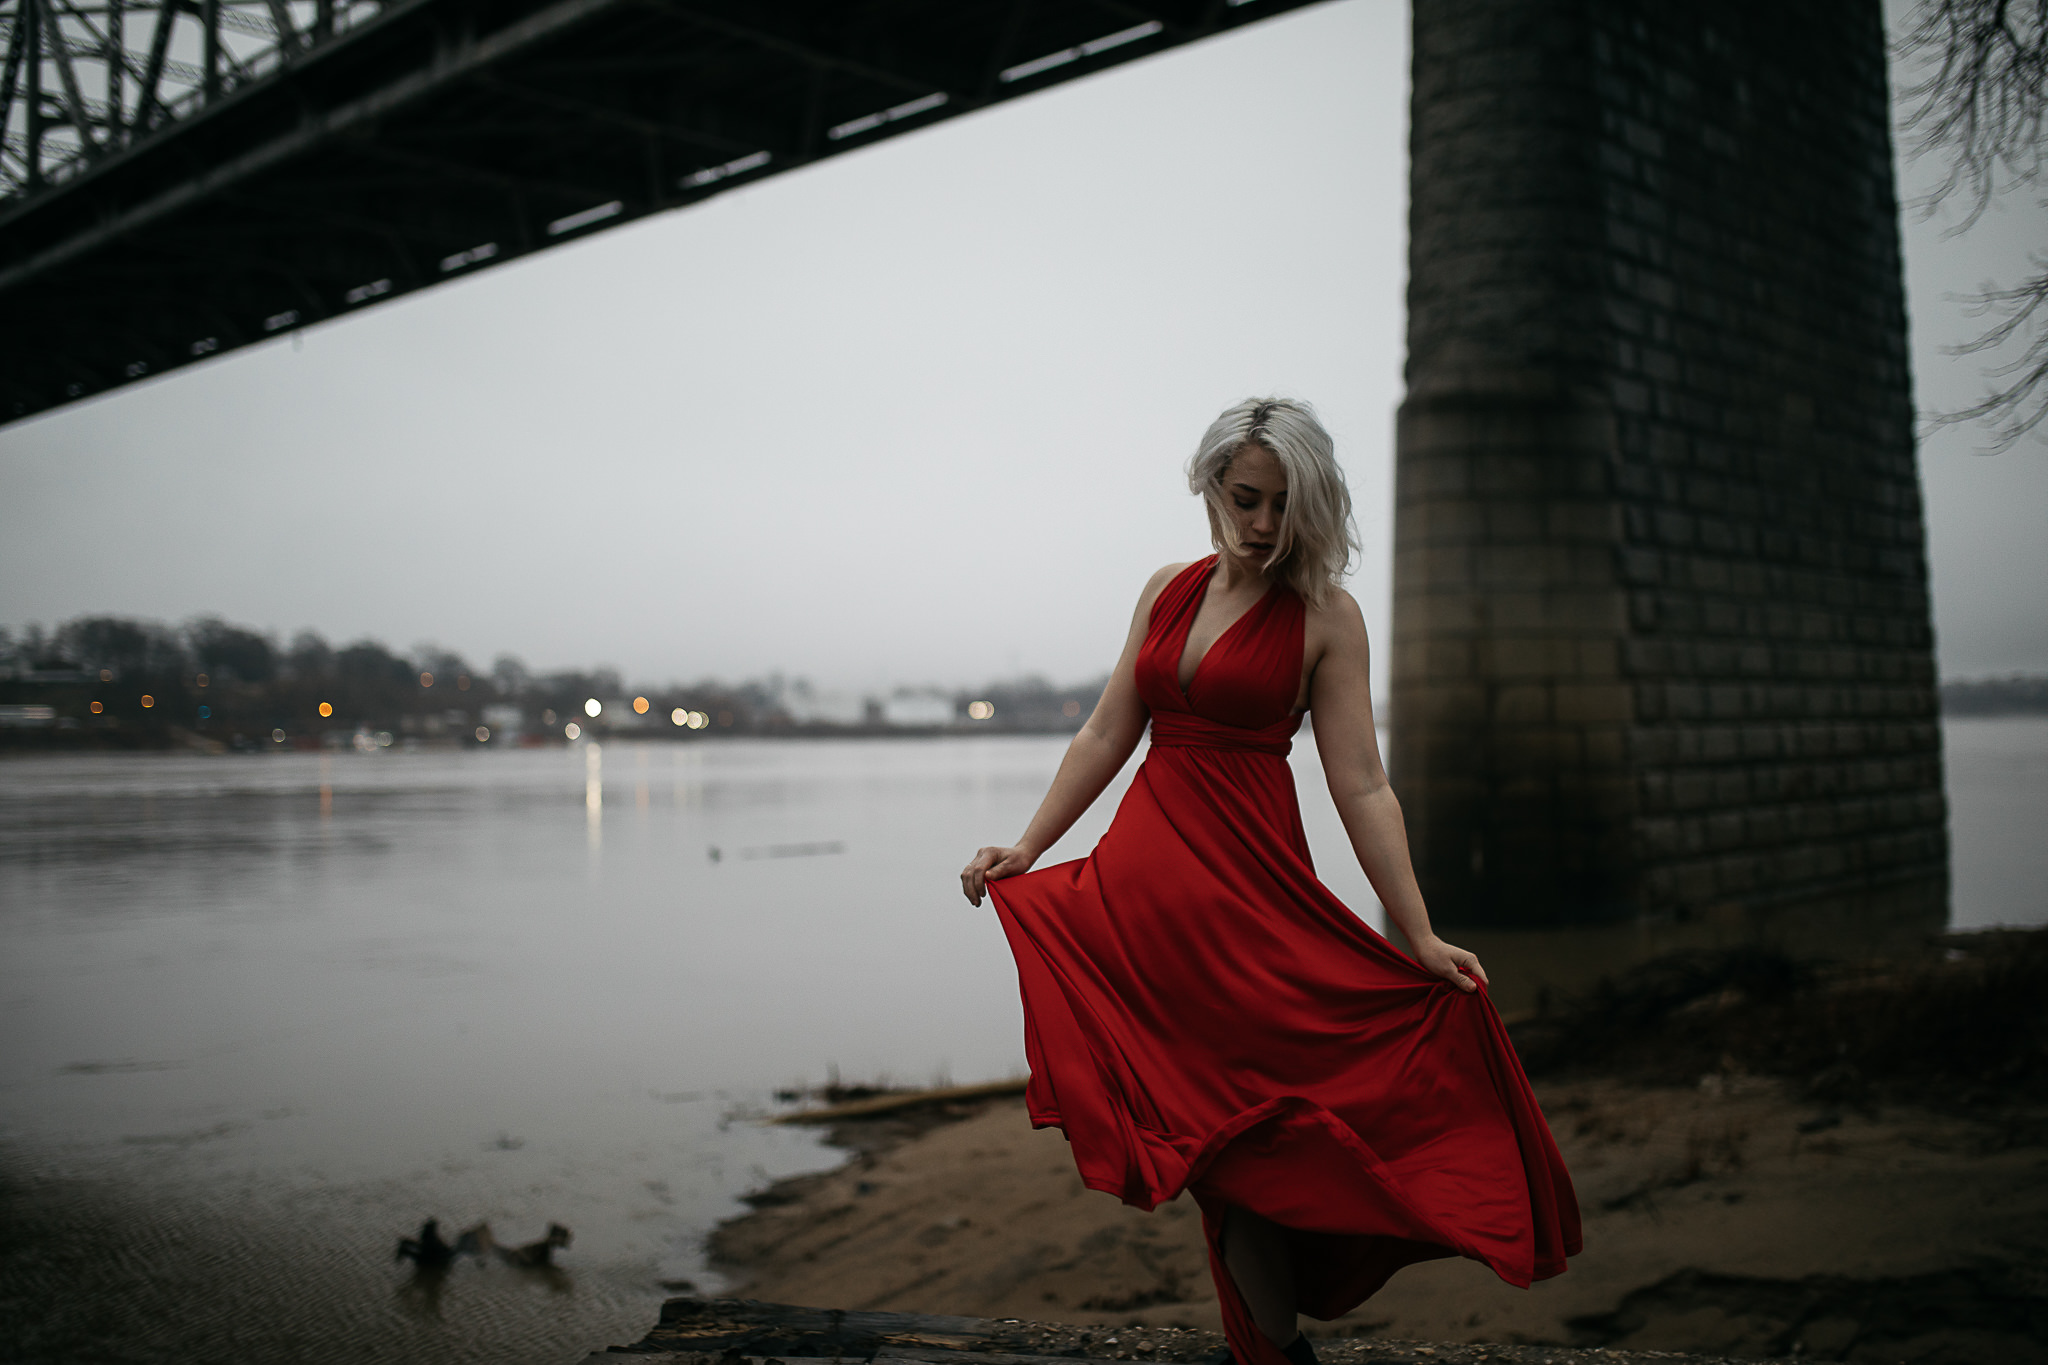 Hosanna-Memphis-Bridge-Red-Dress-Fog-2.jpg